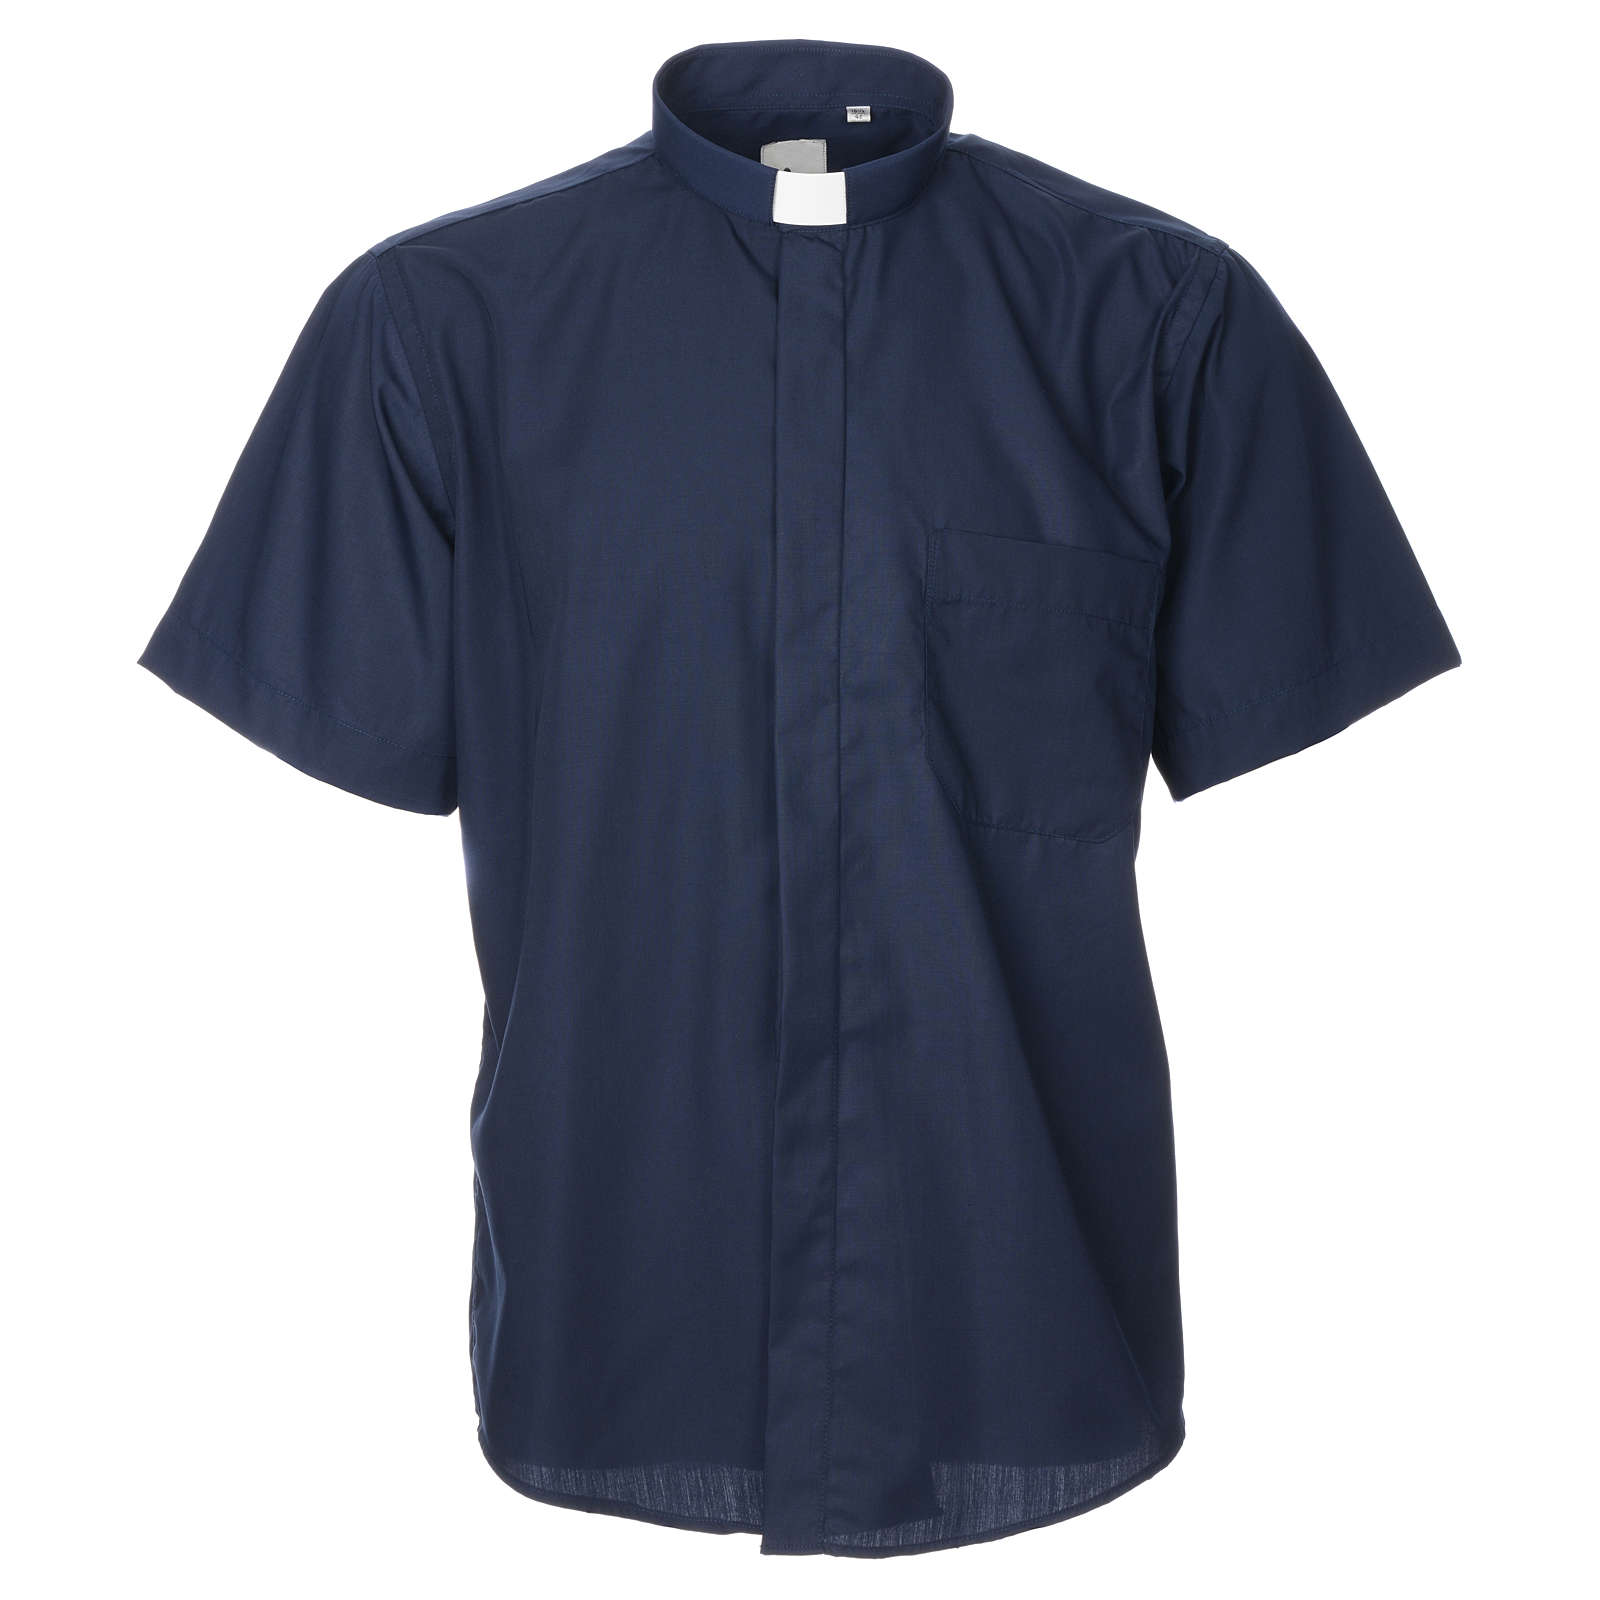 STOCK Clergyman shirt, short sleeves, blue mixed cotton 4